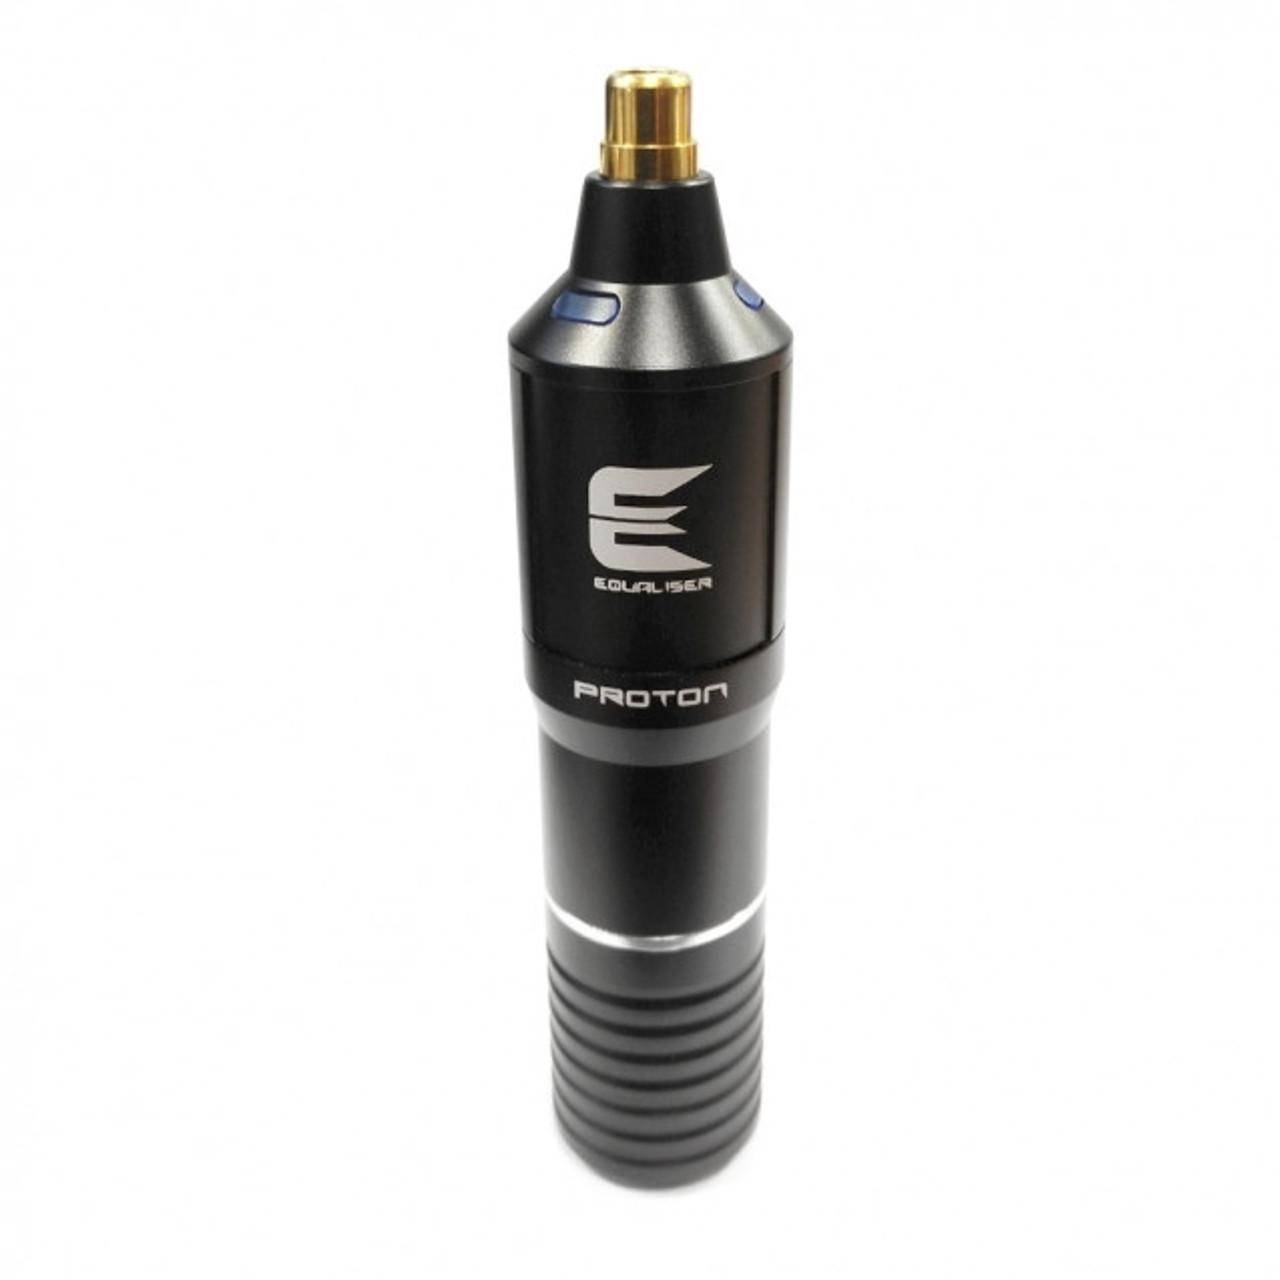 Kwadron Equaliser Proton Rotary Pen Tattoo Machine - Electrum Supply